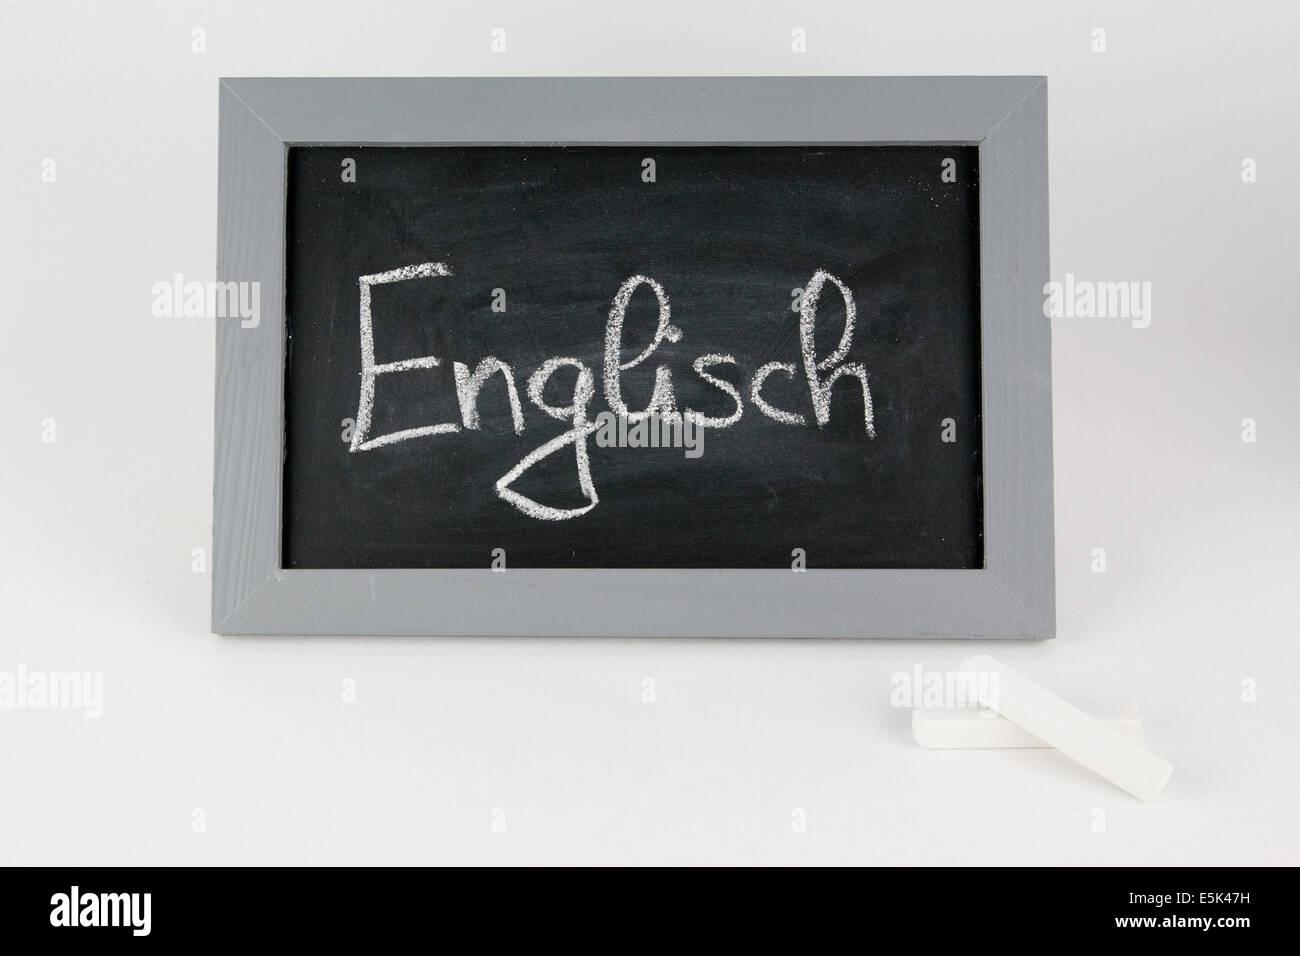 Tafel Englisch Vokabeln abc Alphabet Kreide Schule Schultafel Schulkreide Schulkinder schreiben Grammatik Rechtschreibung - Stock Image